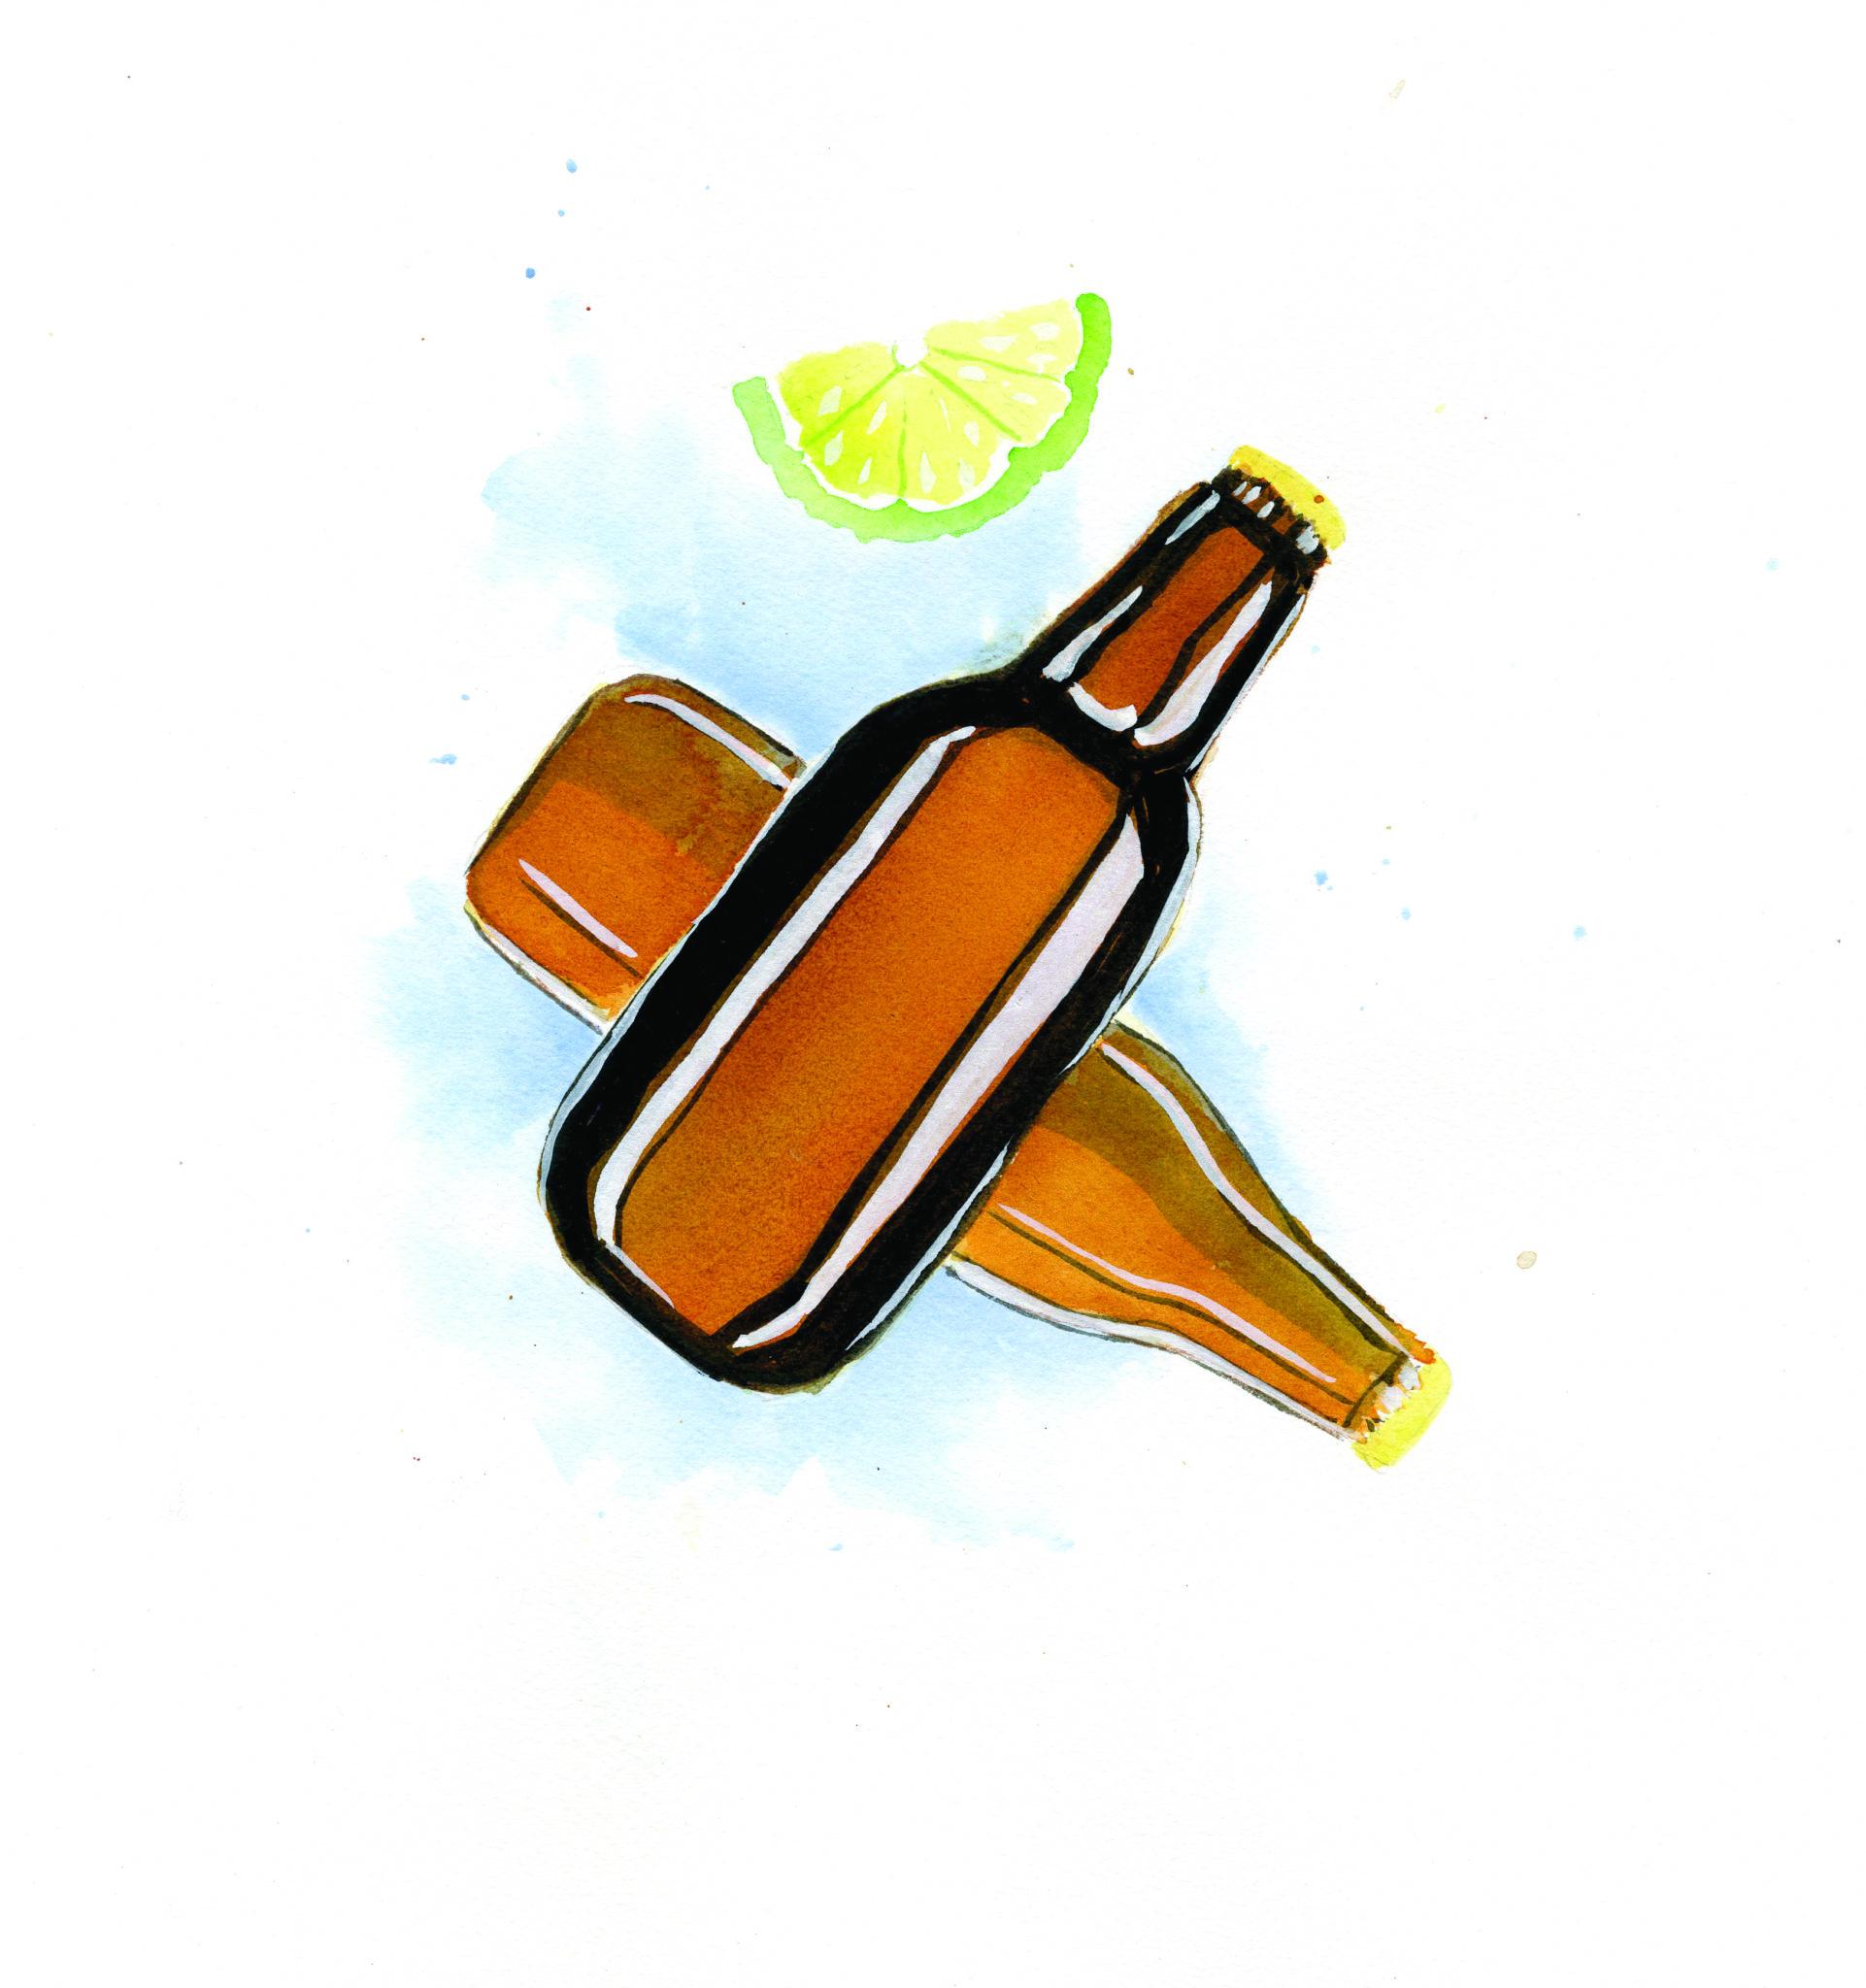 jacques_patricia_0005_chef-vish_beer_spot2.jpg